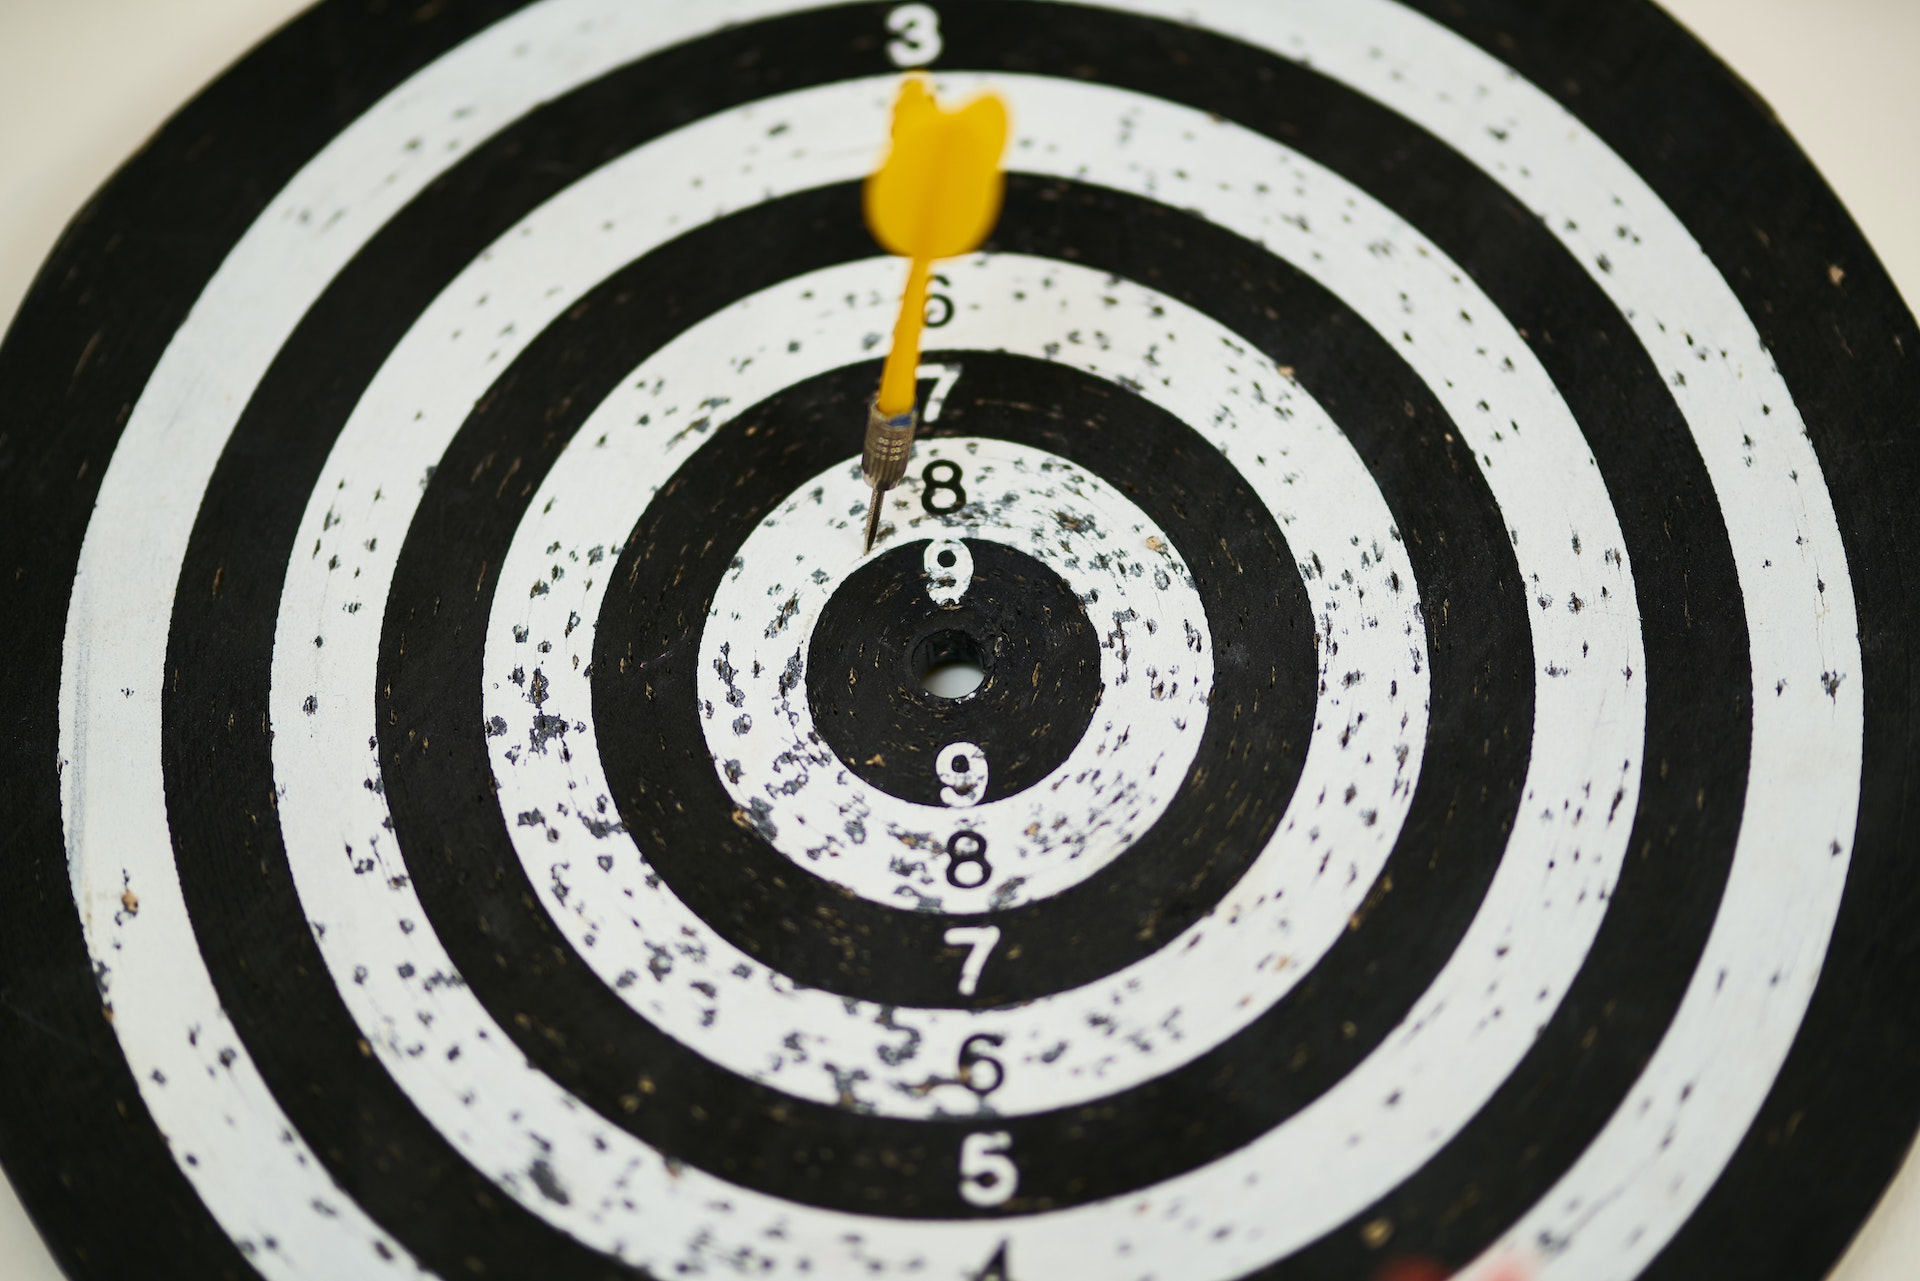 Amazon listing optimization: image of a dartboard